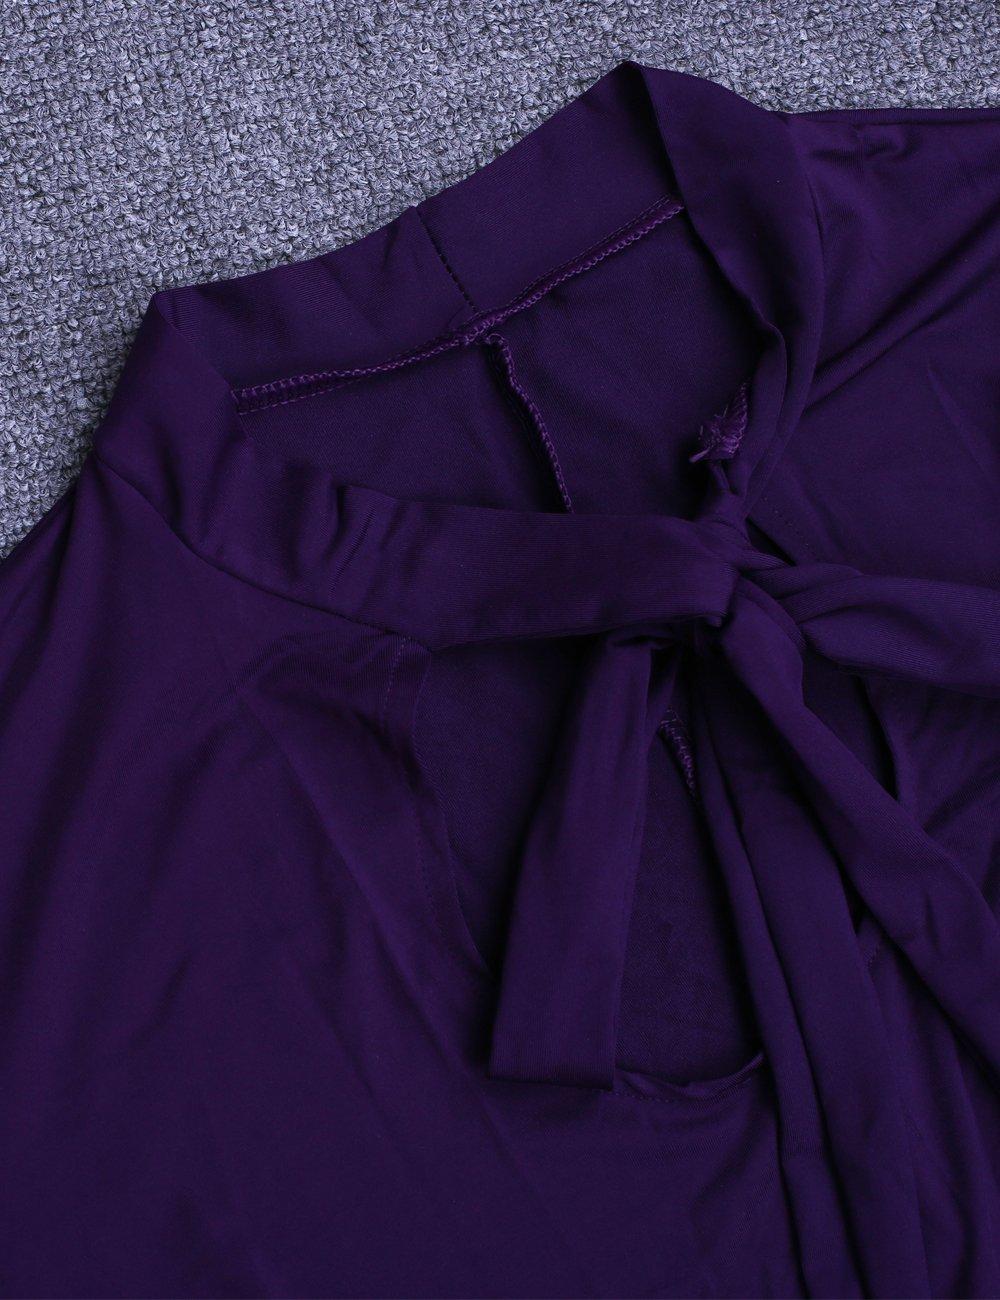 59bdfd1ab97 Lalagen Women s Vintage Long Sleeve Plus Size Evening Party Maxi Dress Gown  Purple XXXL - LLGEA61403PurpleXXXL   Dresses   Clothing